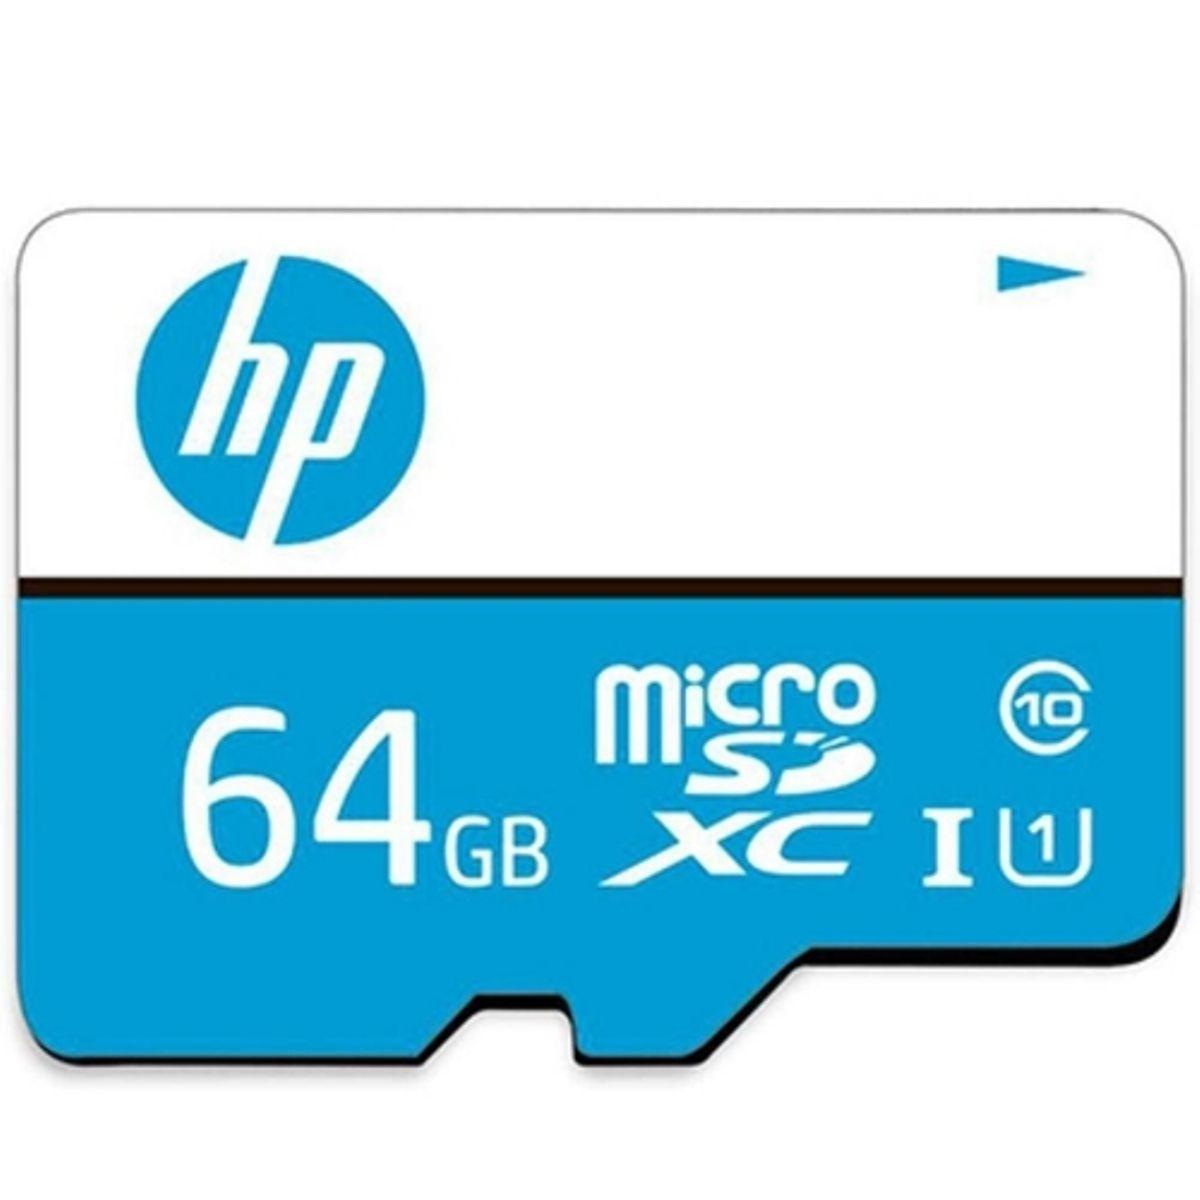 Cartão De Memoria 64gb Classe 10 Captura Vídeo Full Hd 1080p